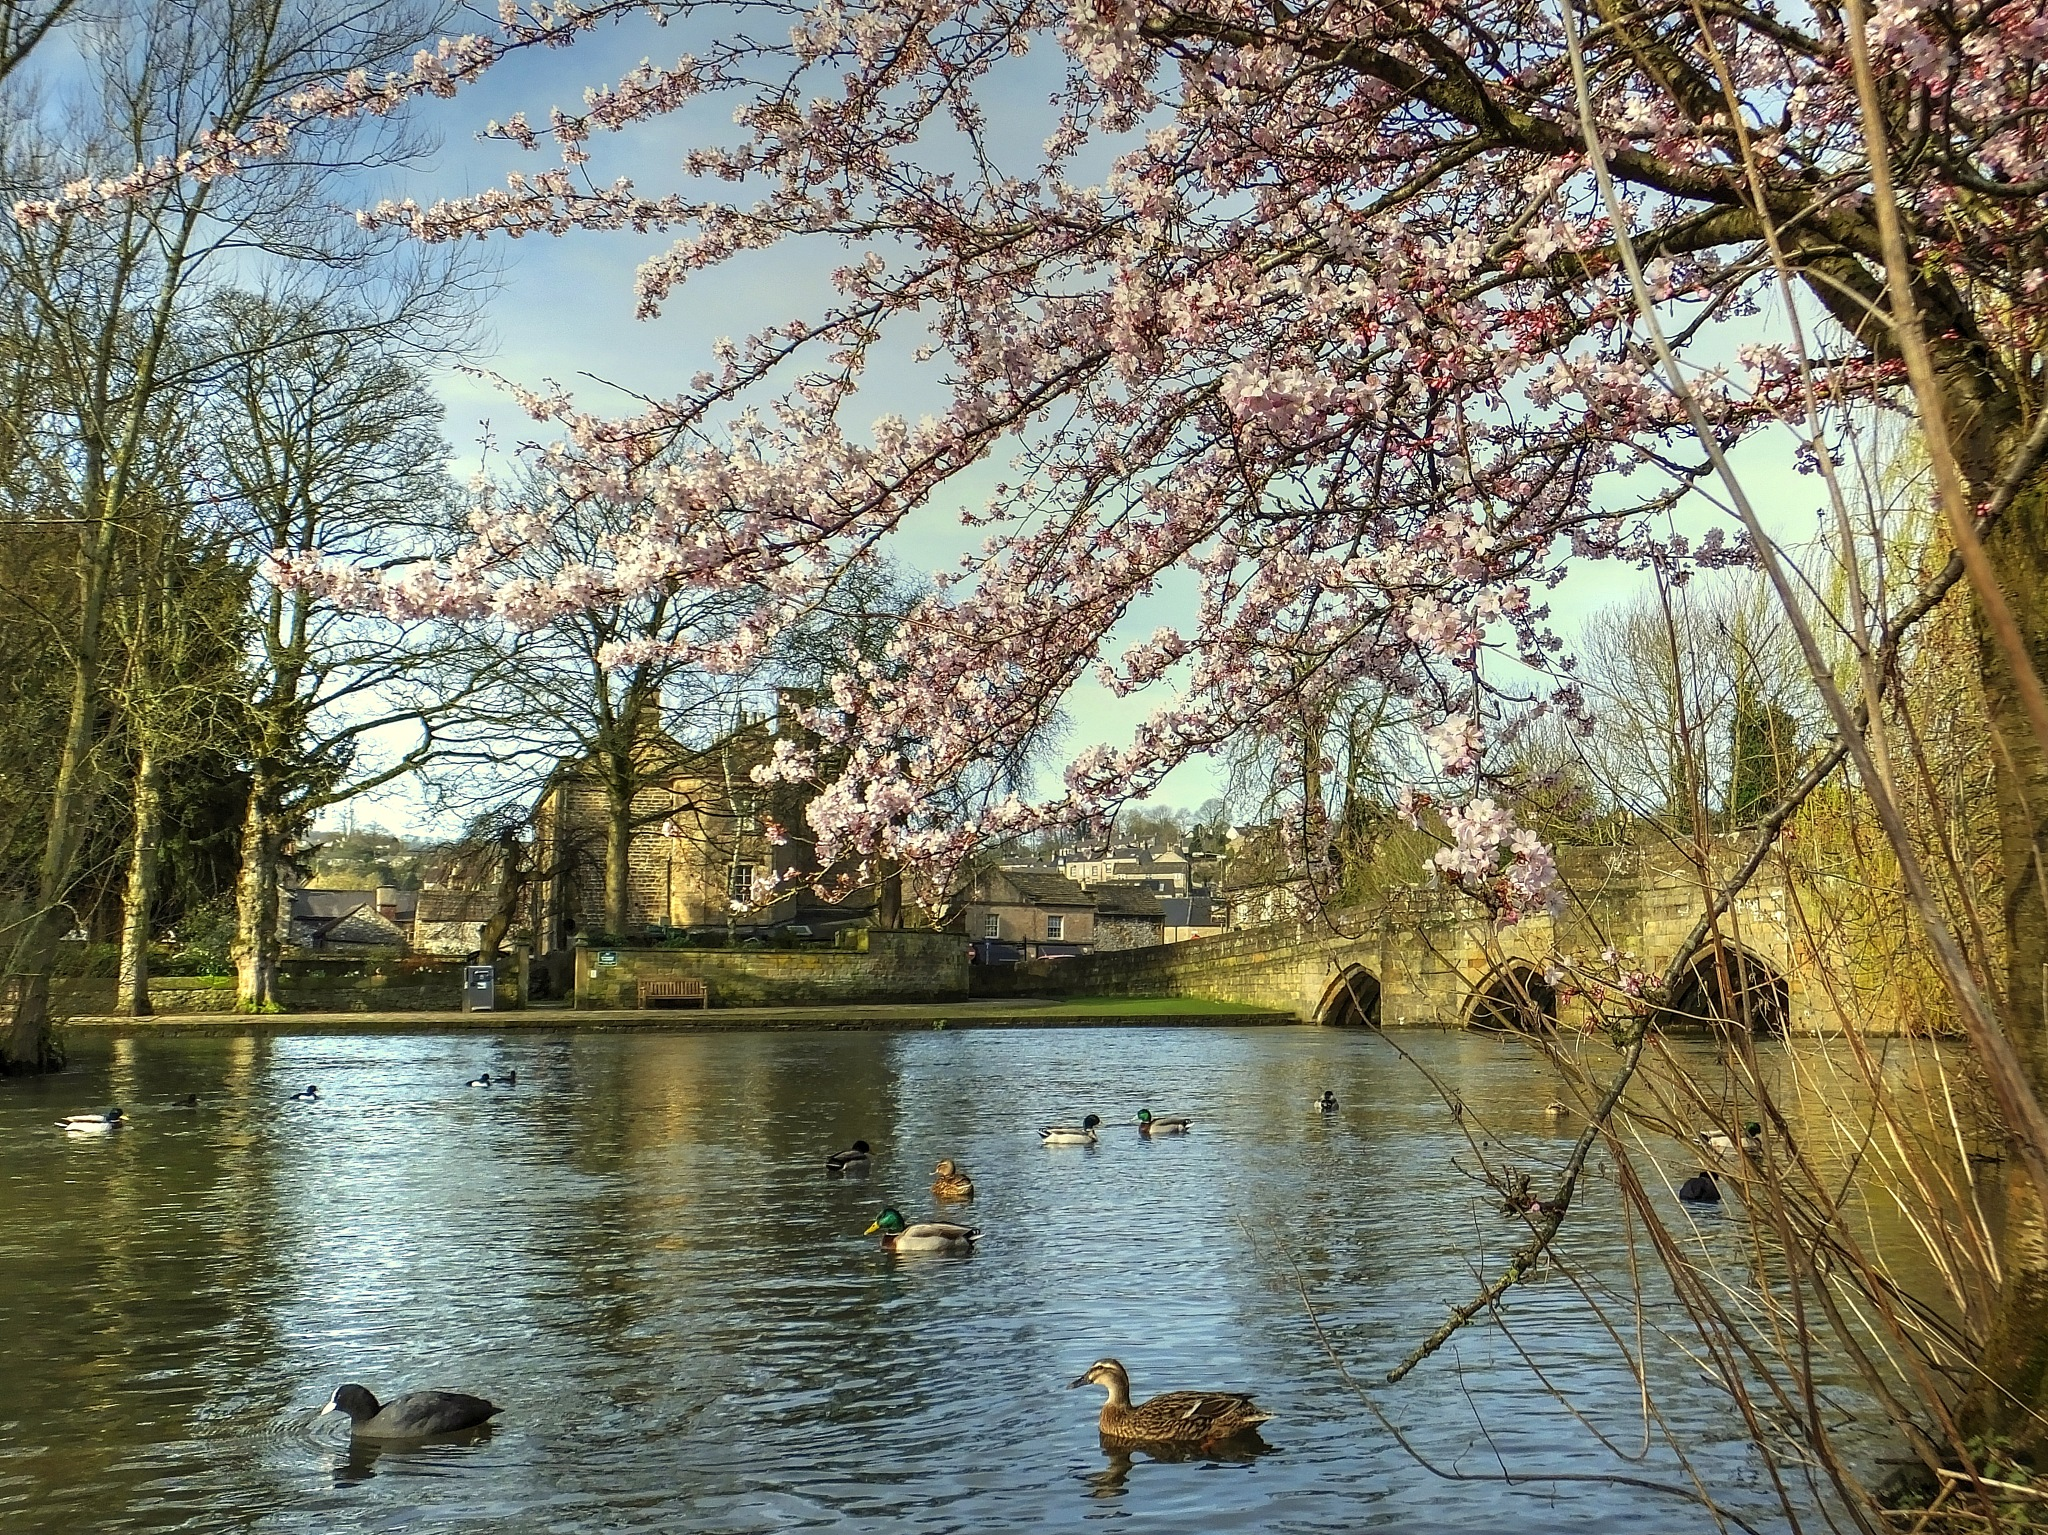 Spring Has Sprung by ianmoorcroft